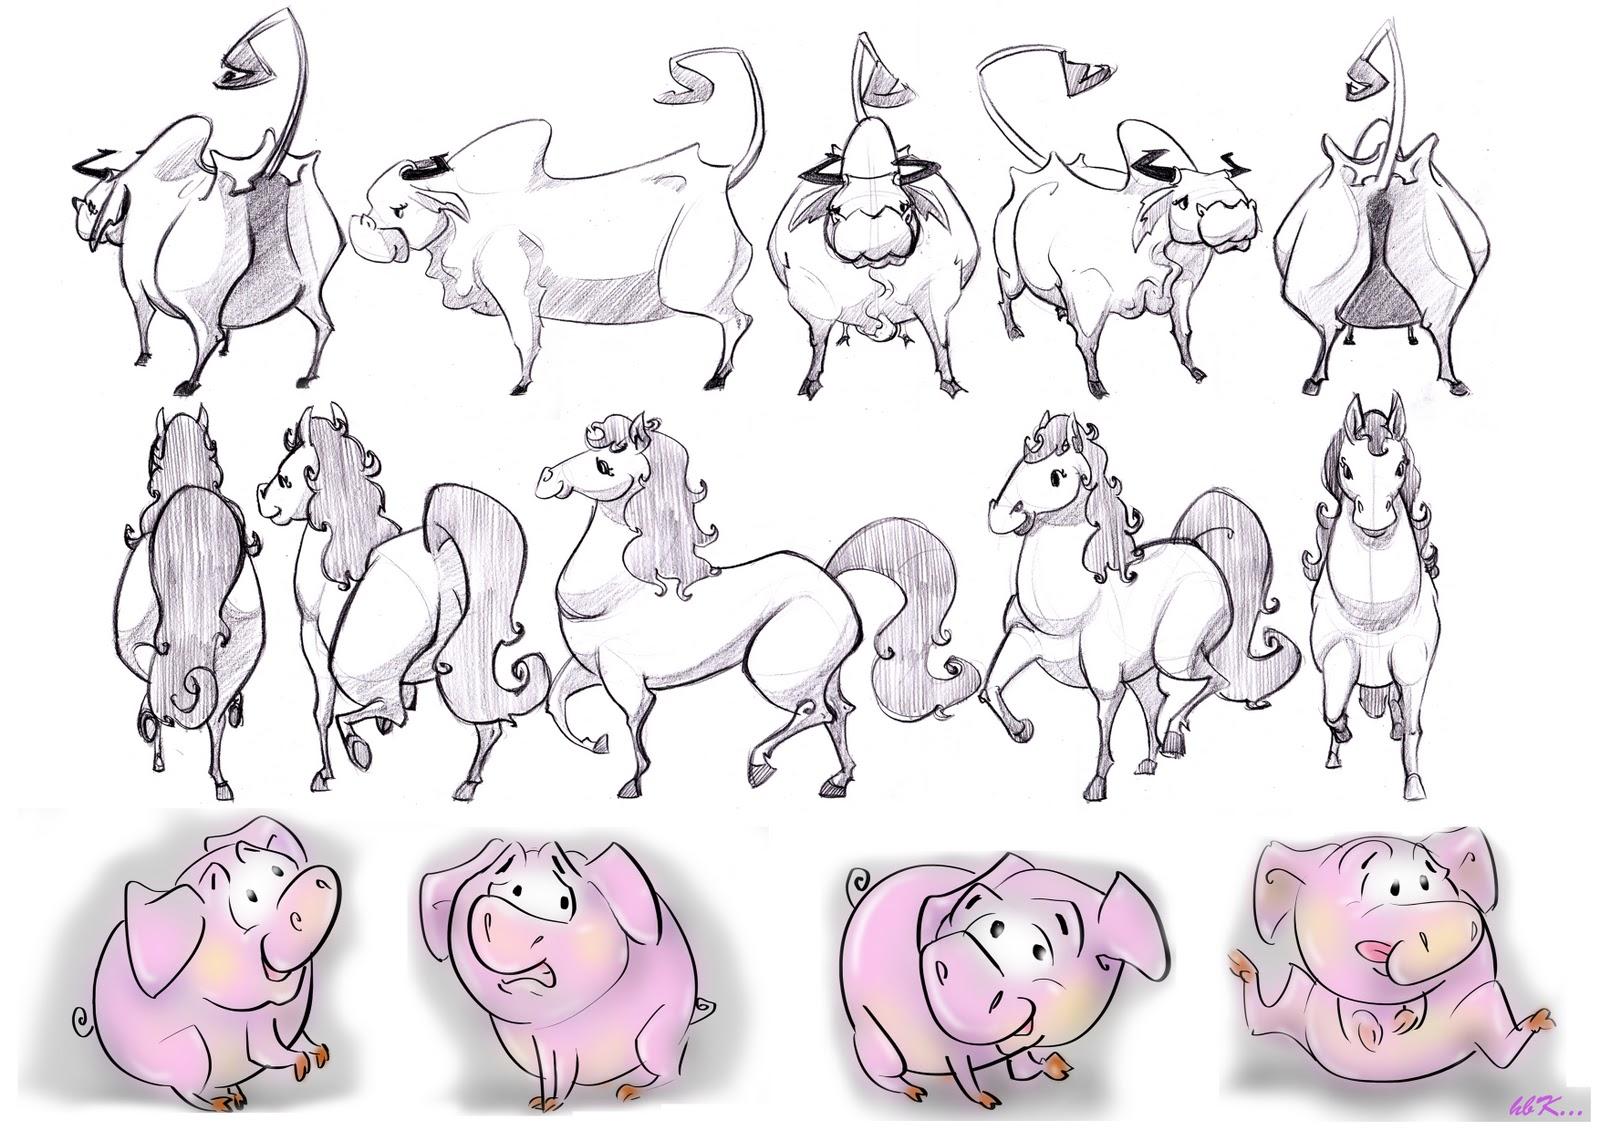 Character Design Studio : Bloomingsun studio character design all styles